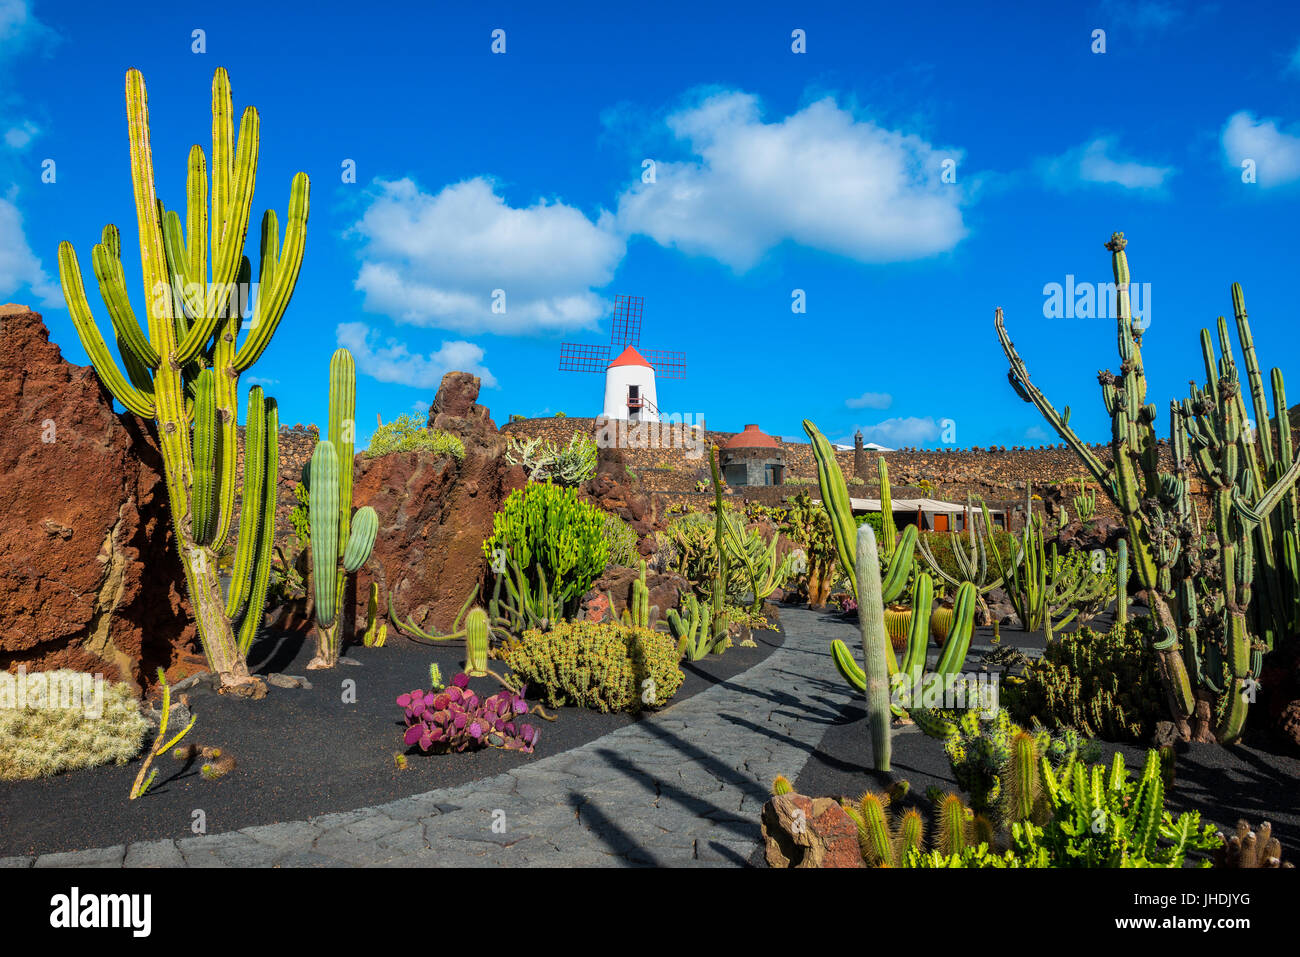 Kakteengarten in Lanzarote, Kanarische Inseln, Spanien Stockbild